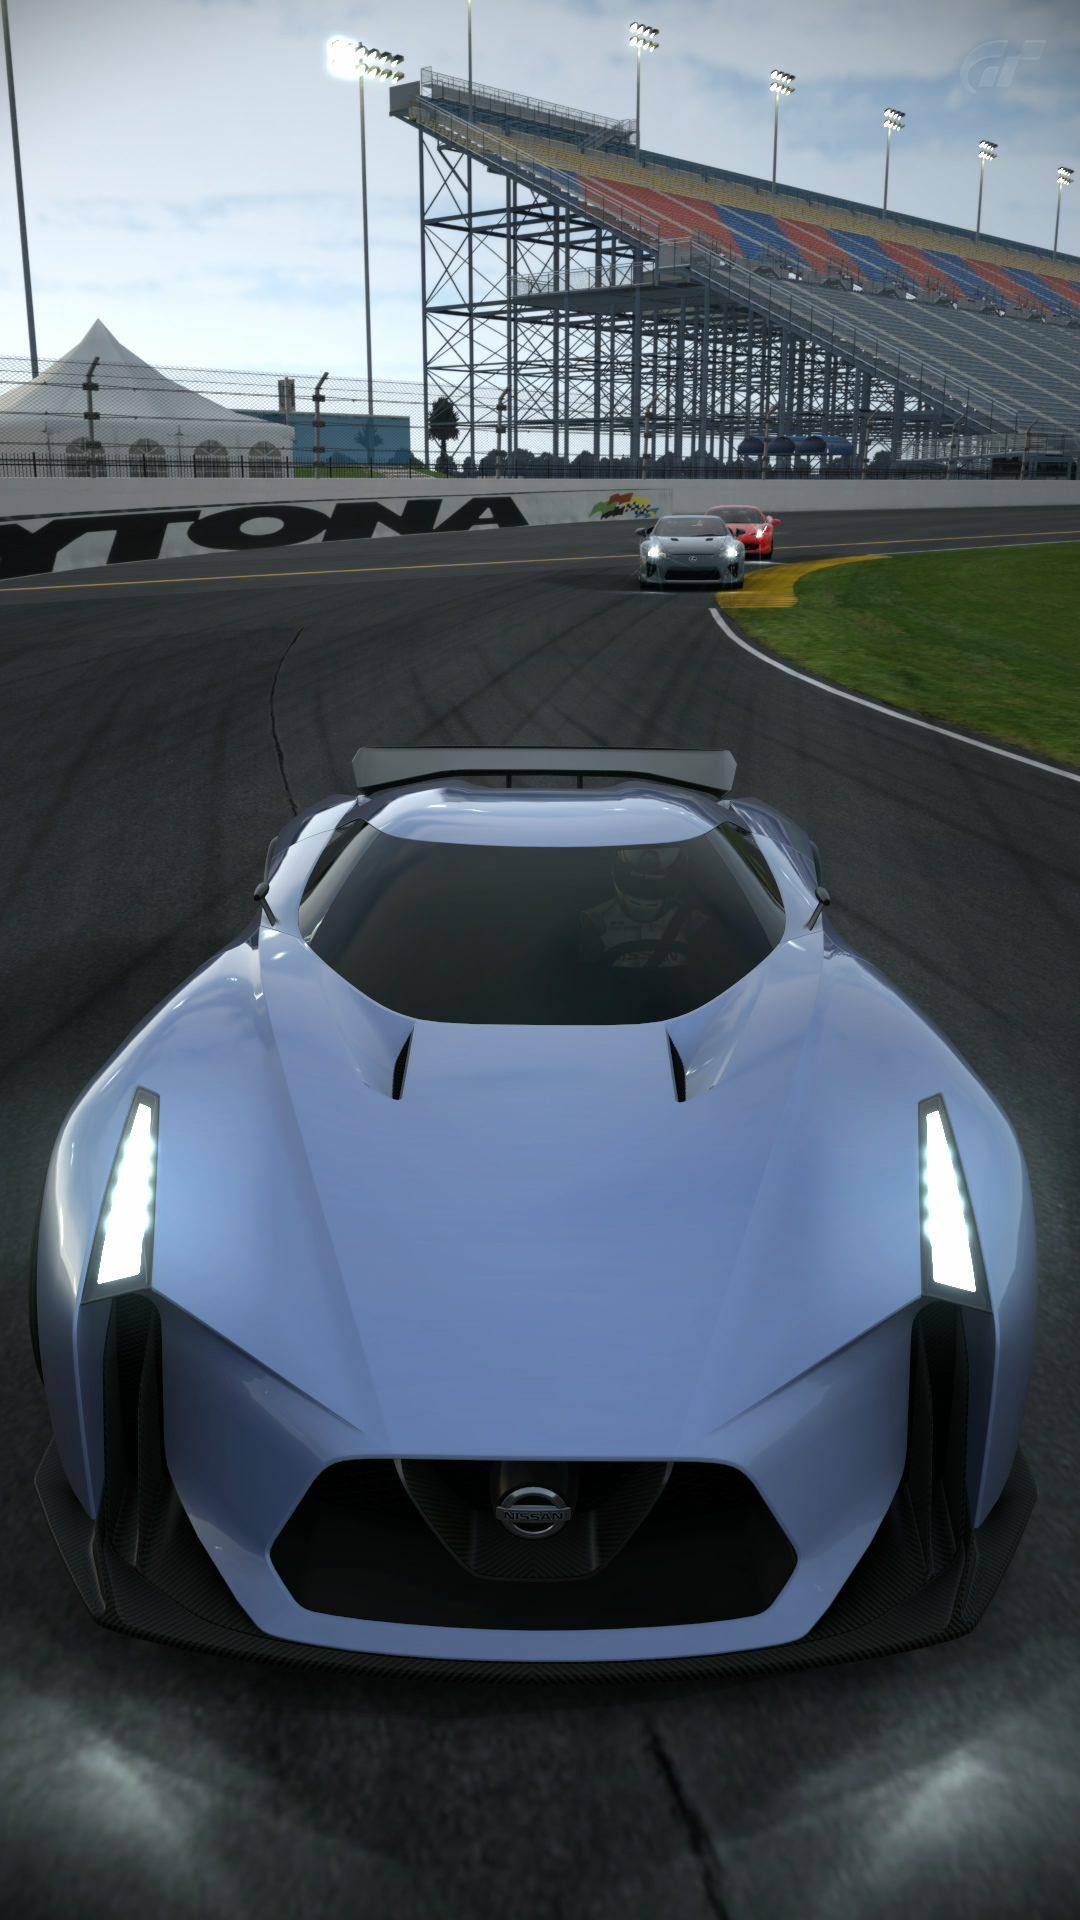 Daytona Road Course - Nissan VGT 15.jpg